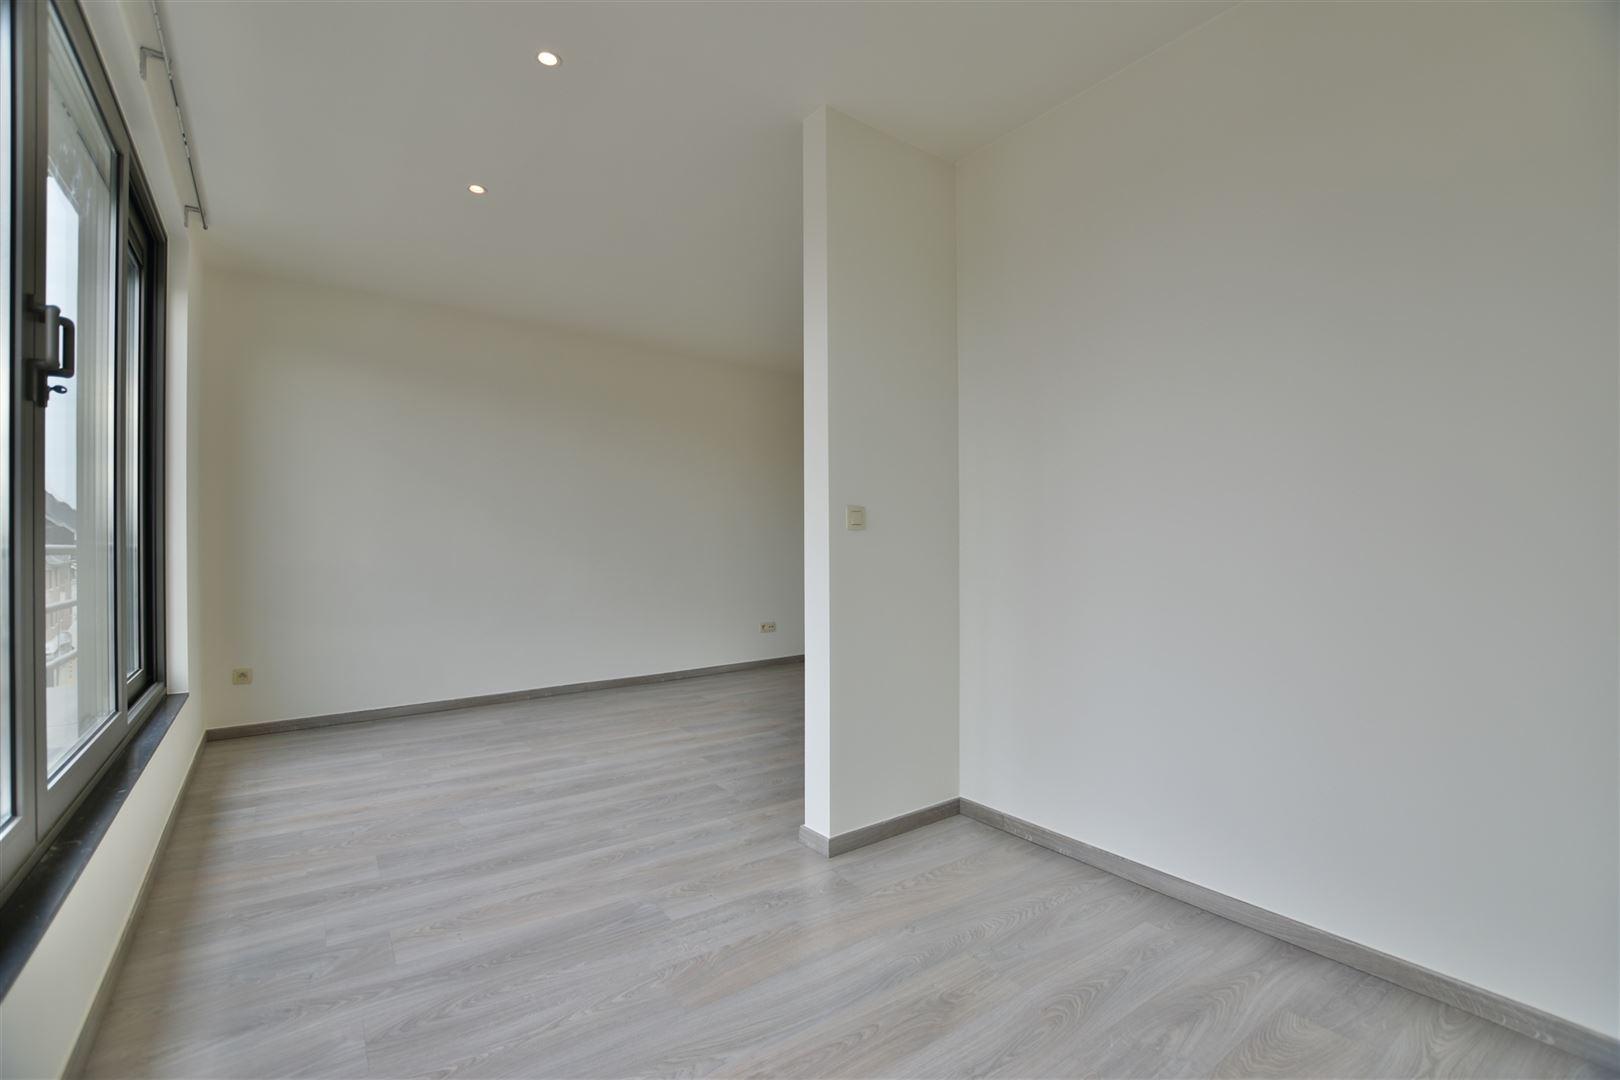 Foto 15 : Duplex/Penthouse te 9200 Sint-Gillis-bij-Dendermonde (België) - Prijs € 278.000